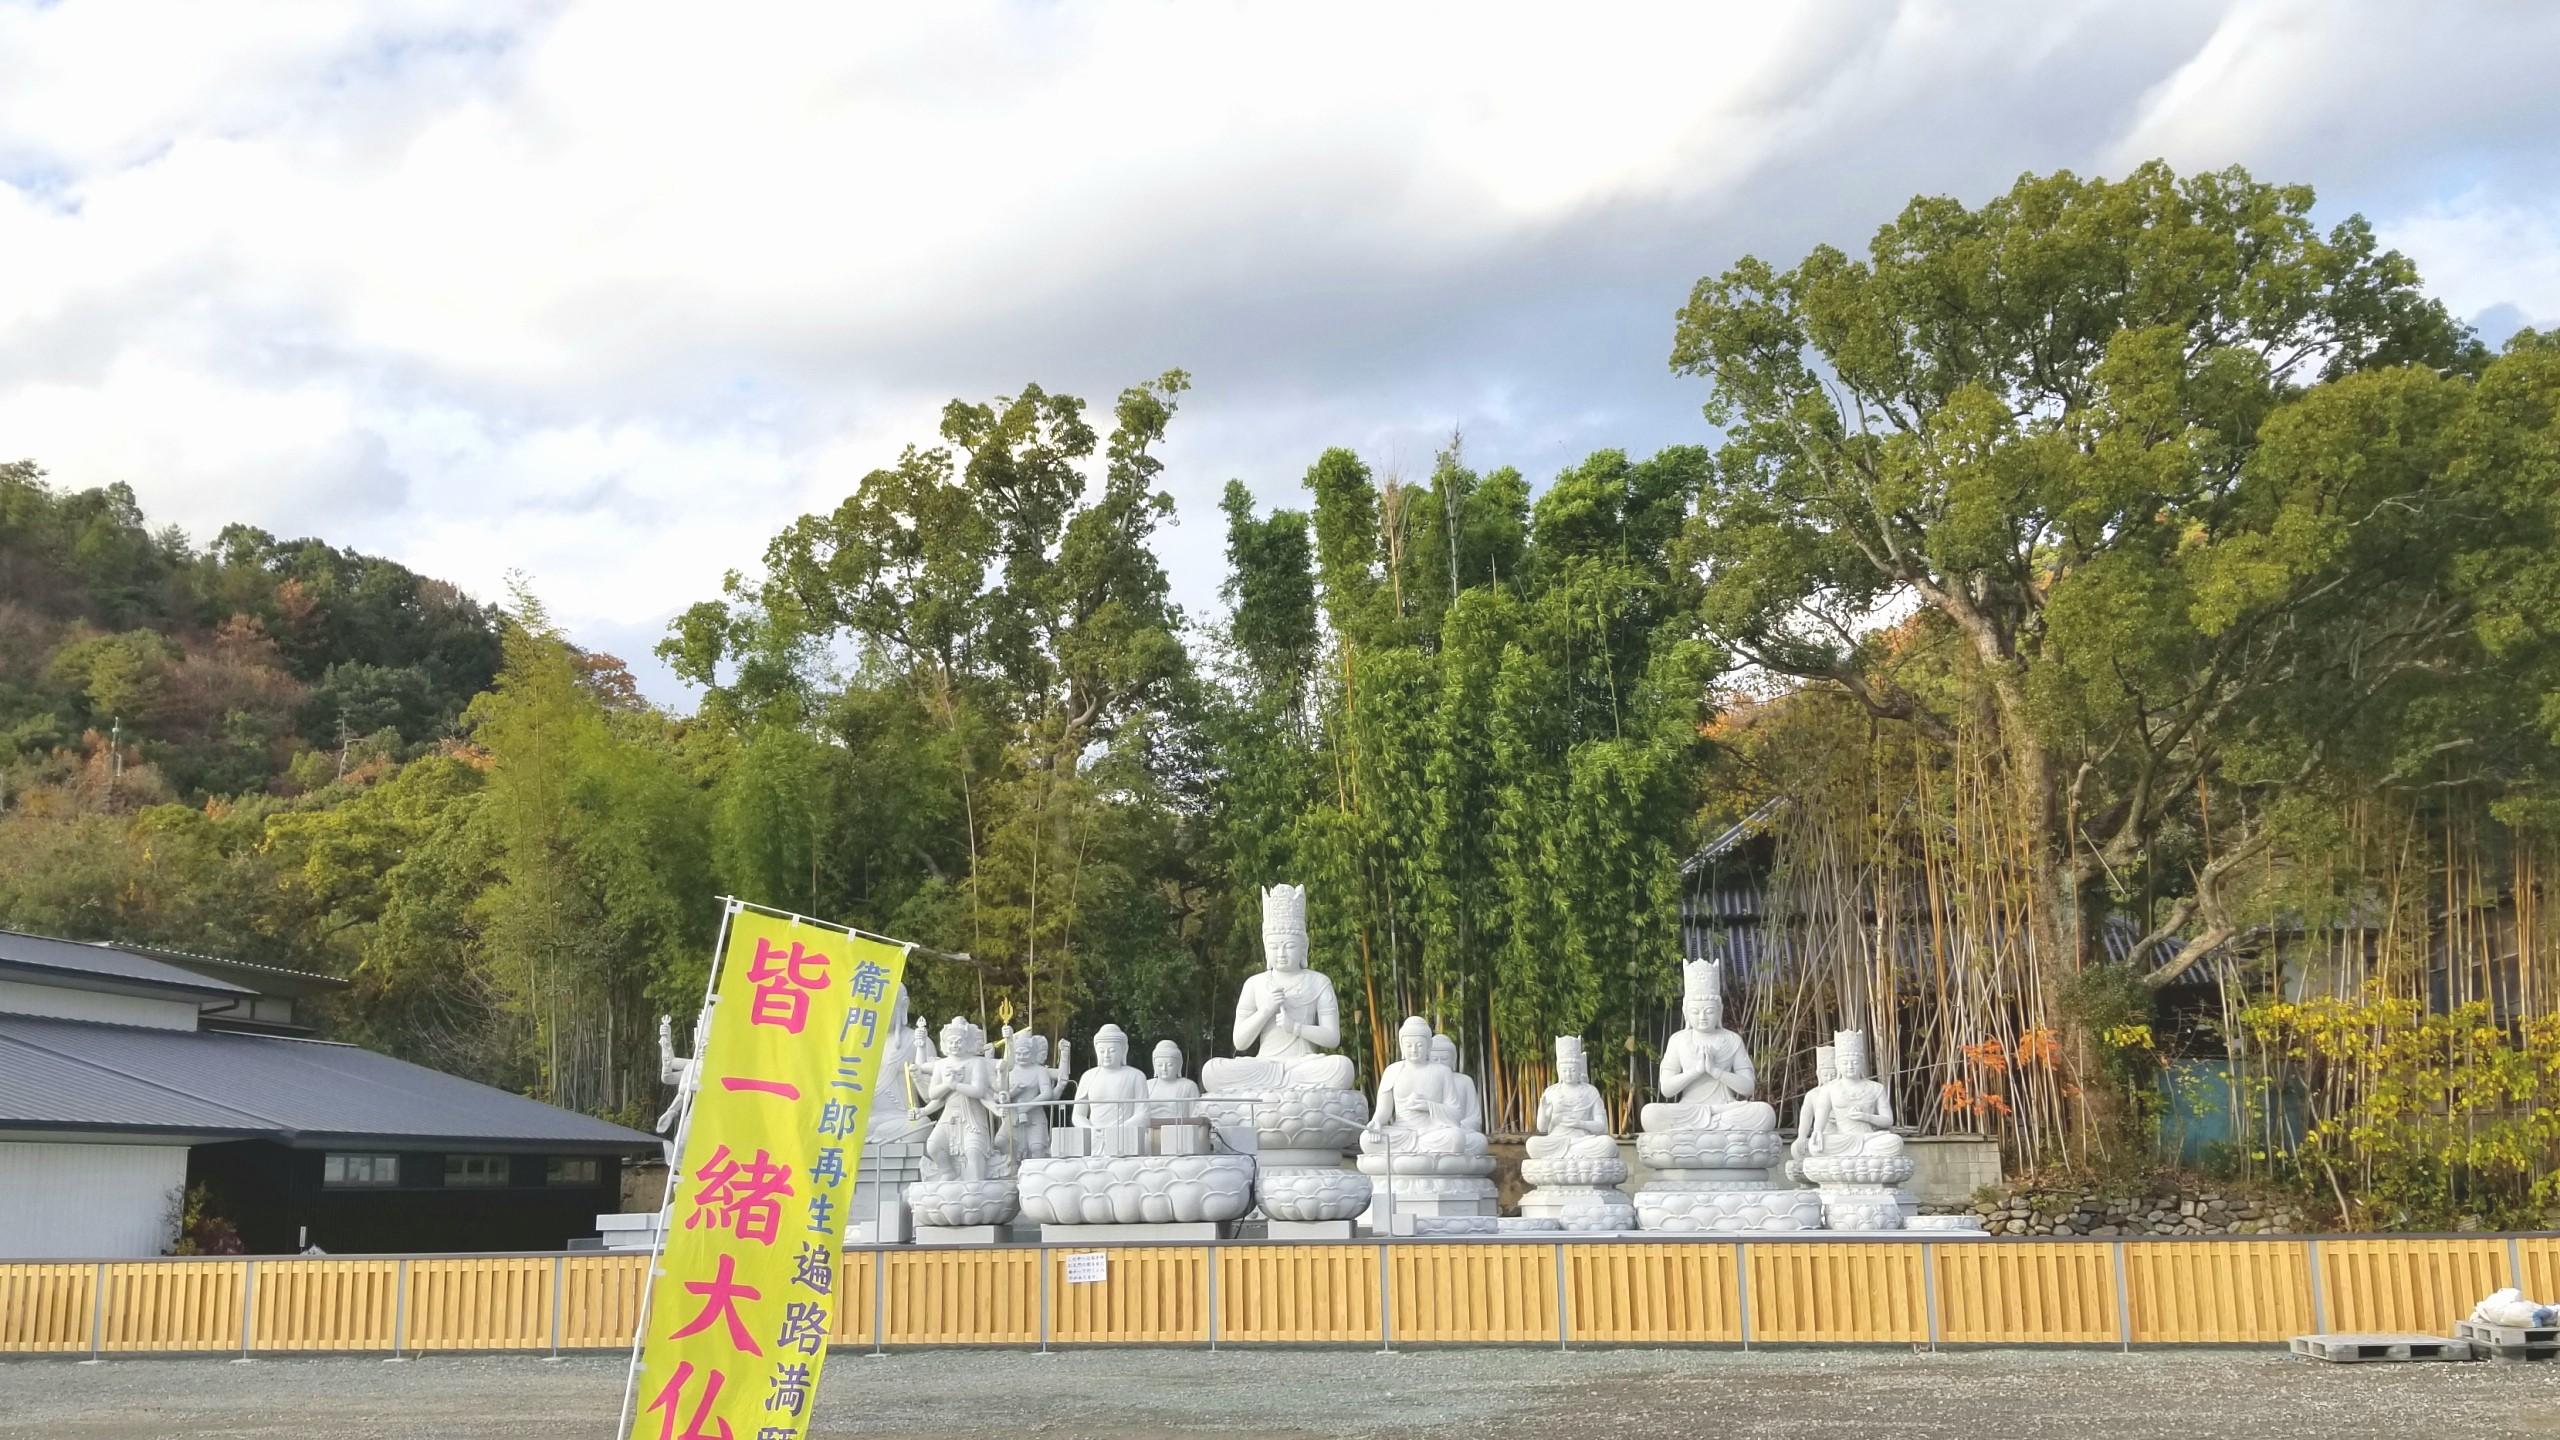 愛媛県松山市石手寺,仏像,墓石,お寺,四国八十八ヶ所巡り,近く近所